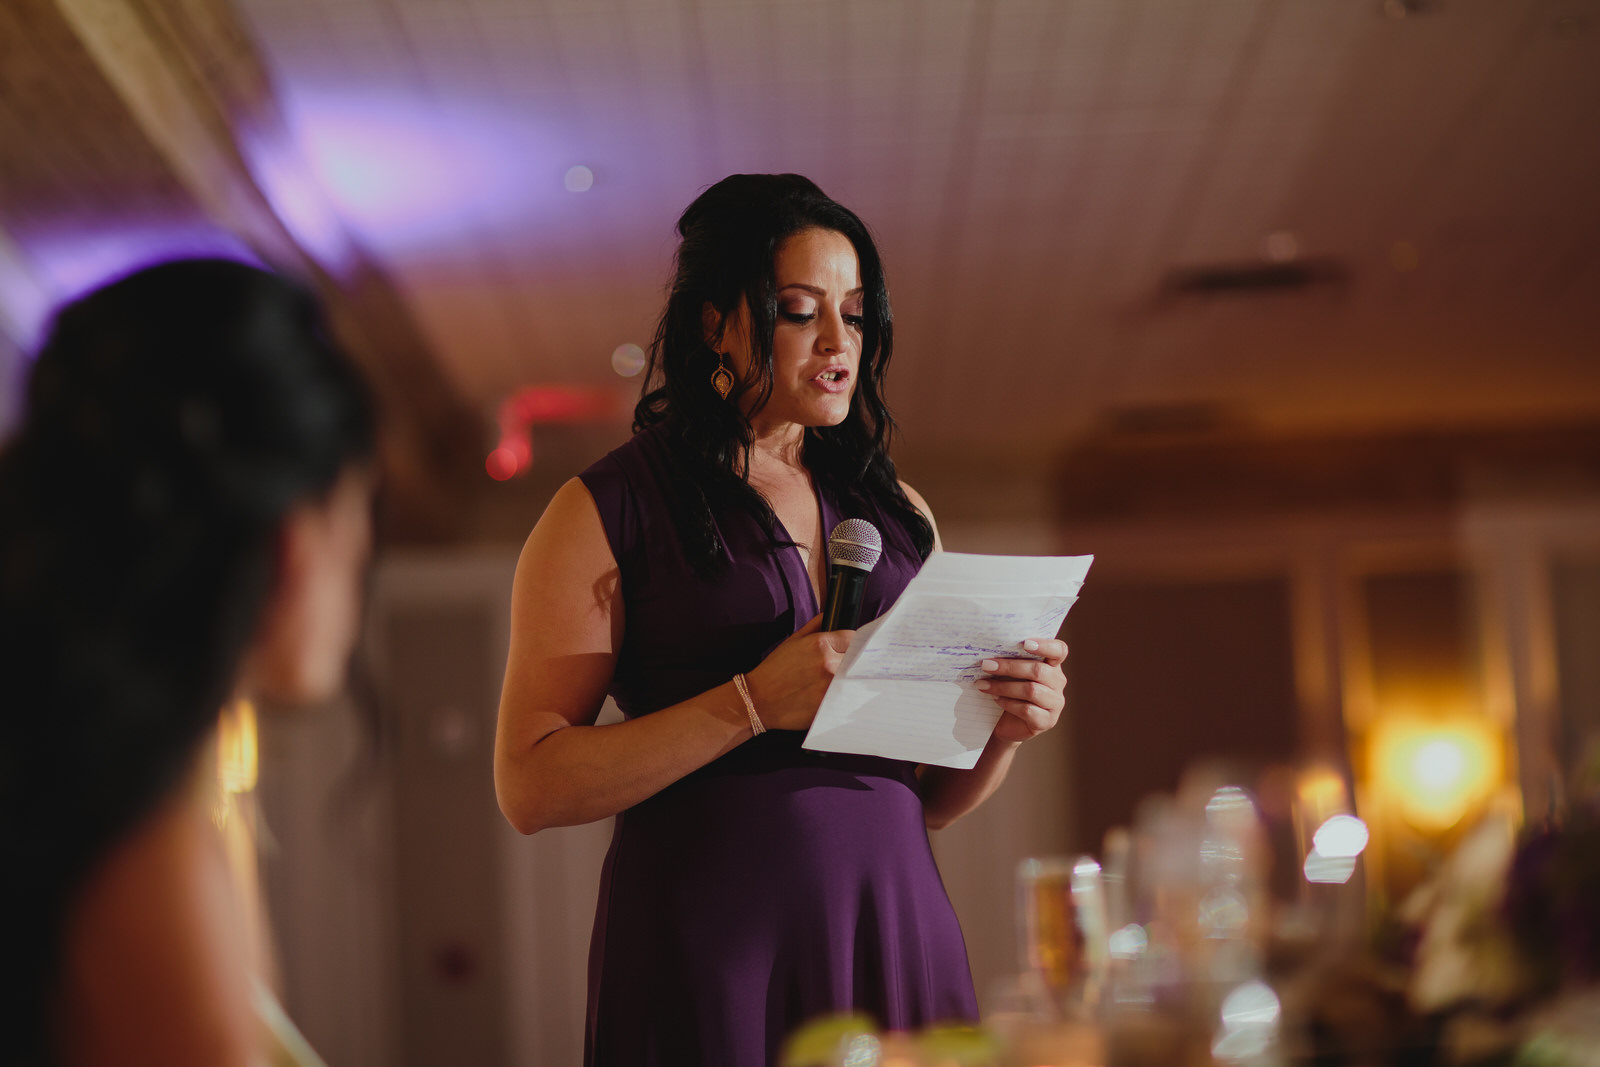 bridesmaid_speech_tiny_house_photo_real_weddings_travel_destination_international.jpg